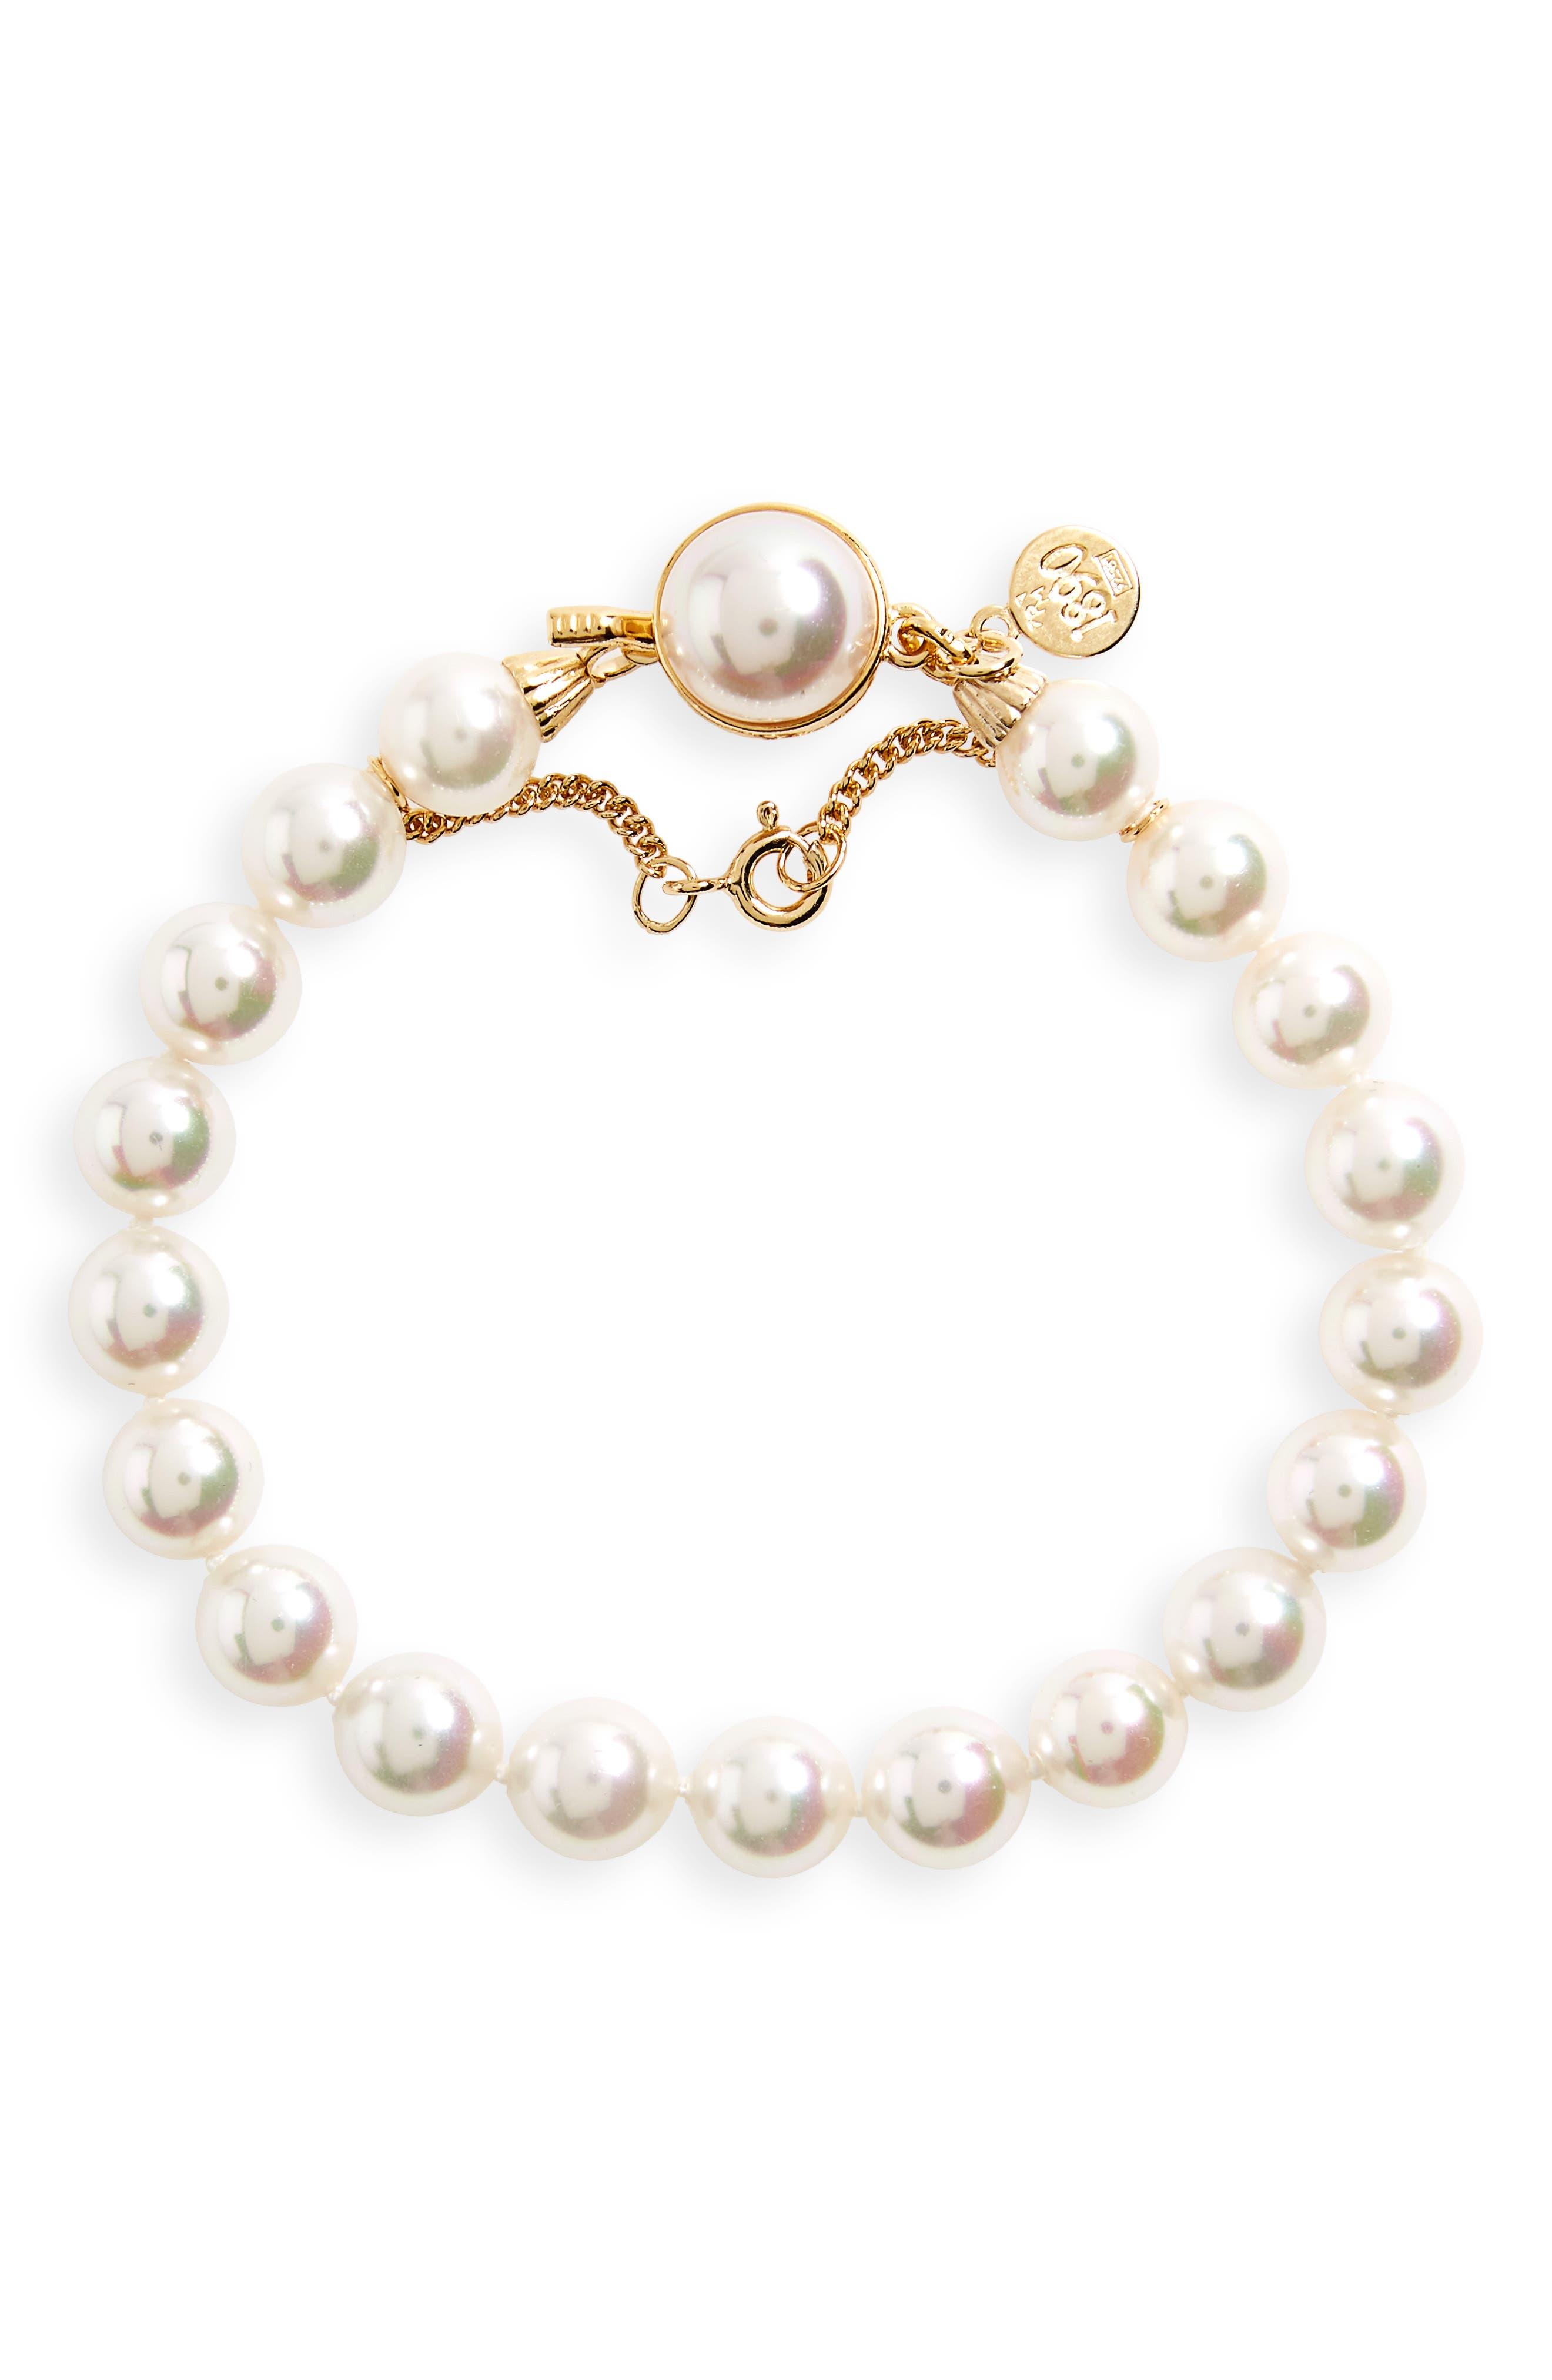 8mm Single Row Pearl Bracelet,                             Alternate thumbnail 2, color,                             WHITE/ GOLD